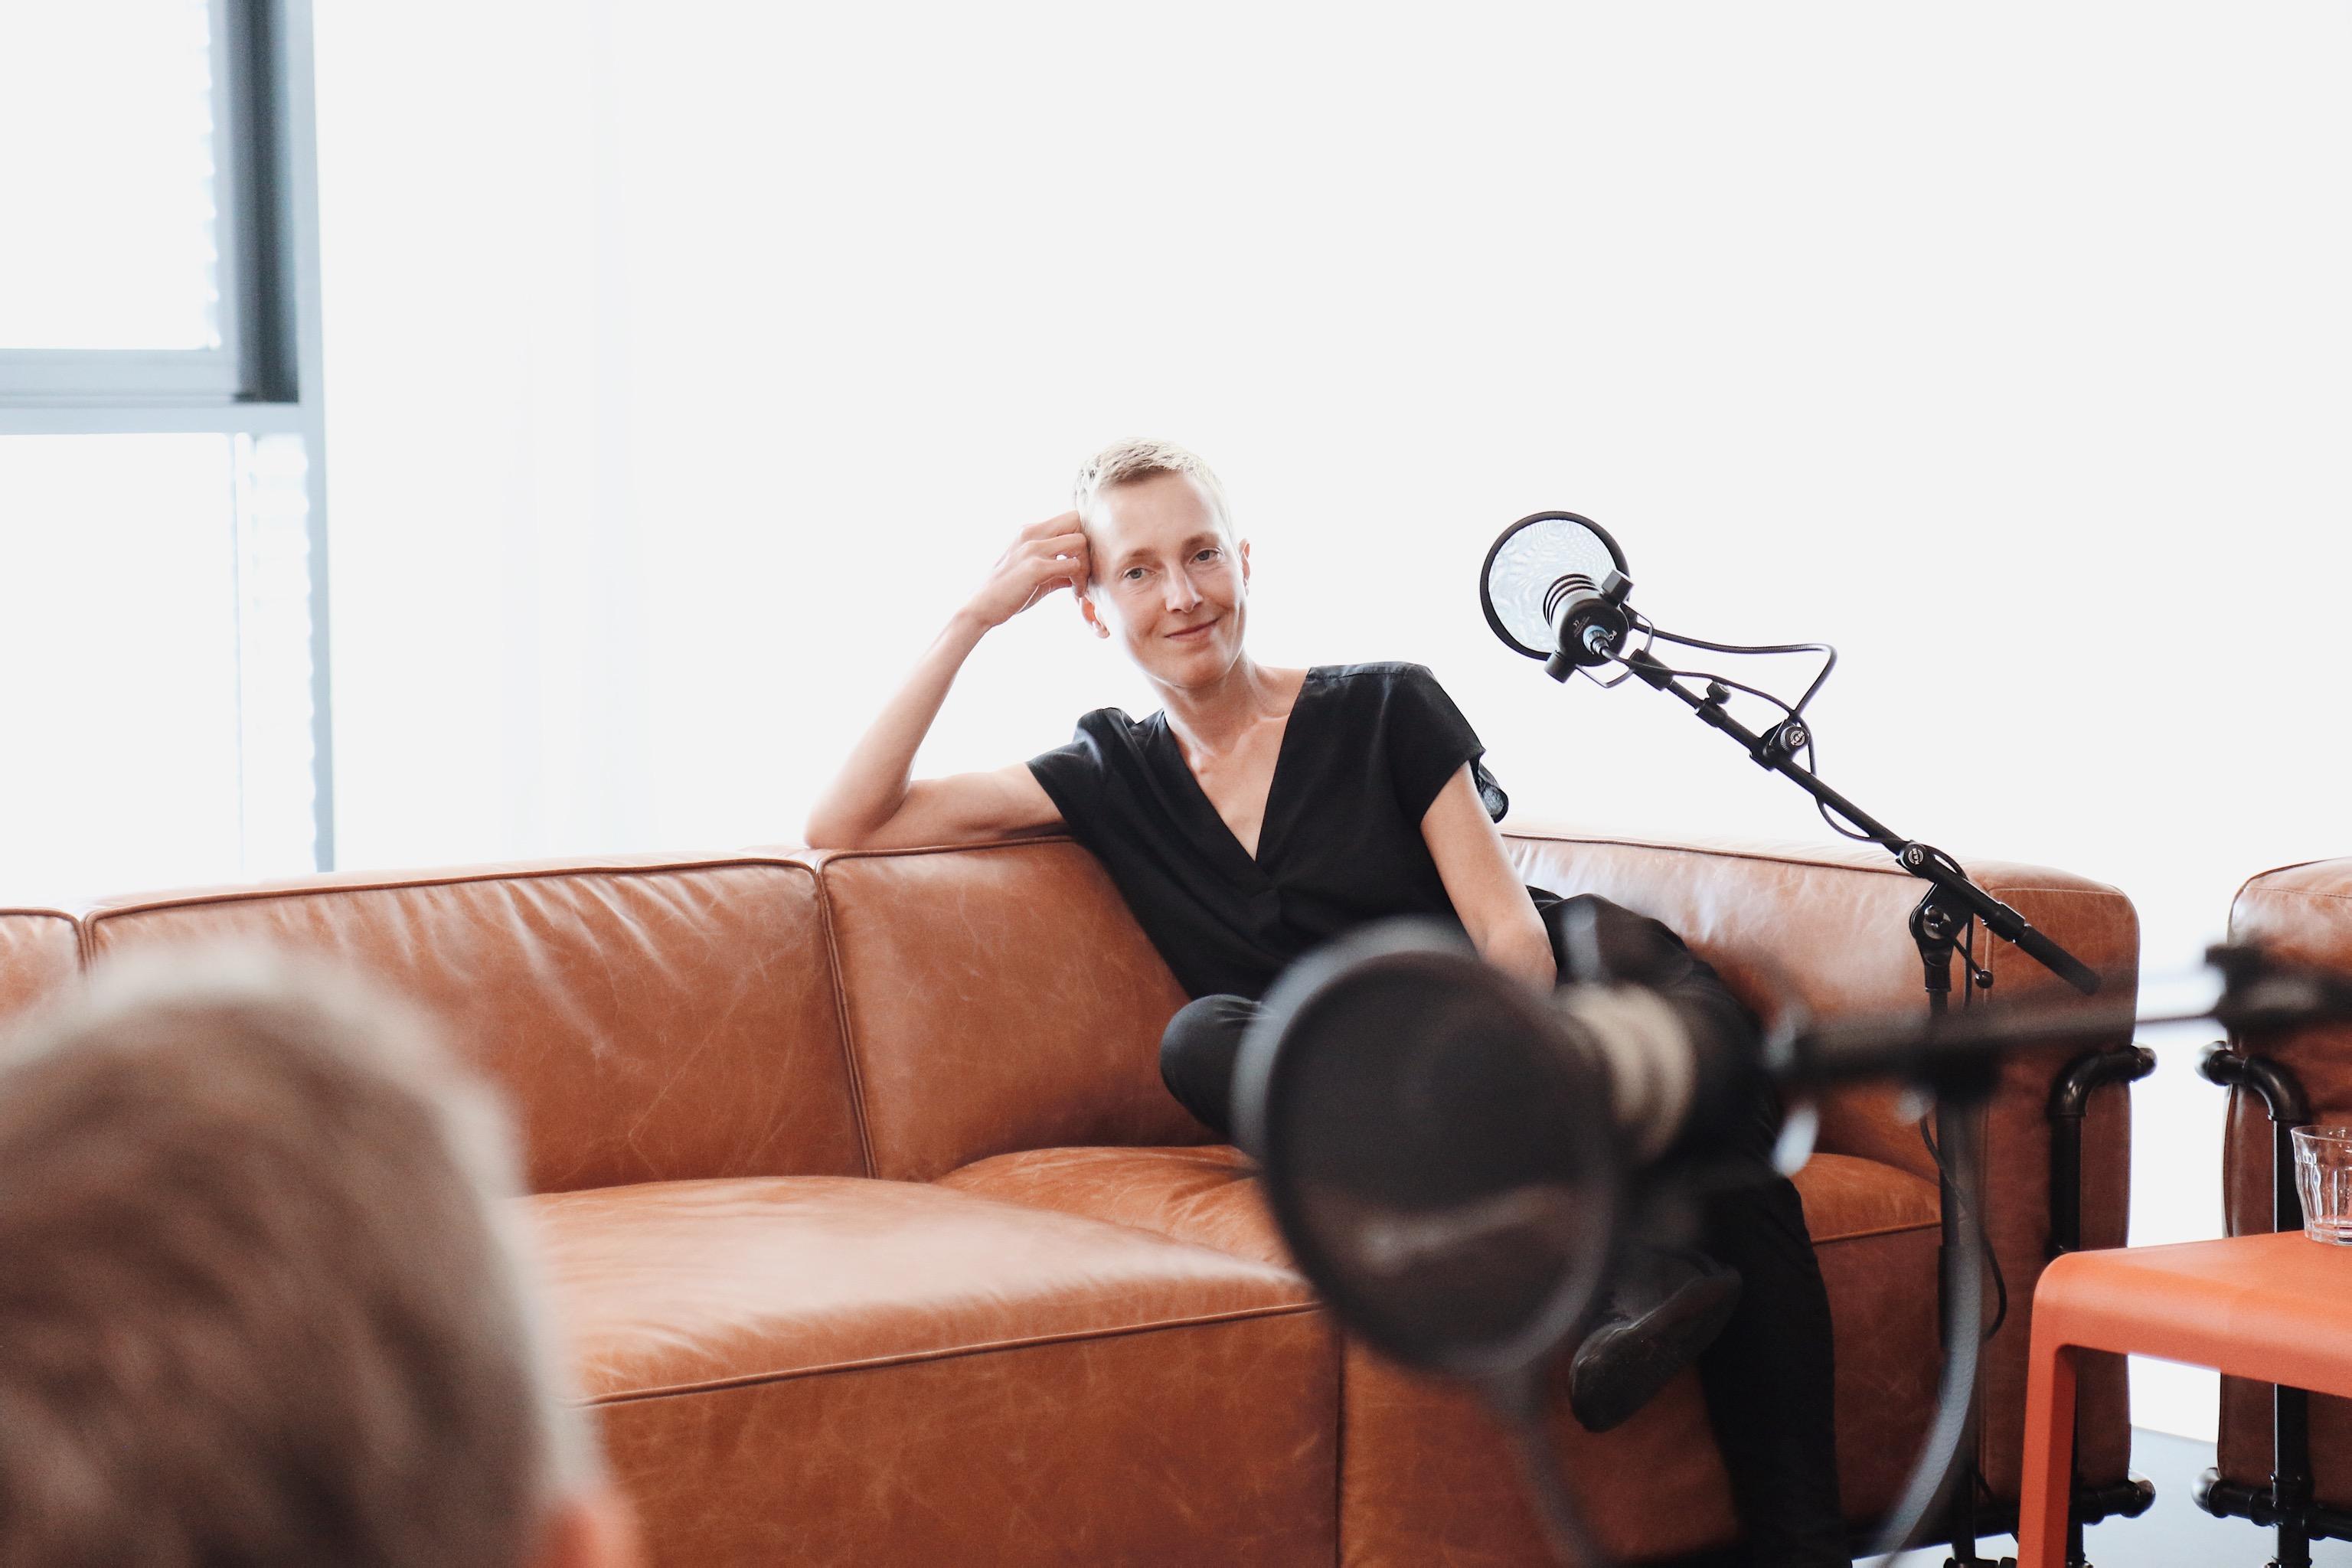 Anja Kirig m.next Podcast